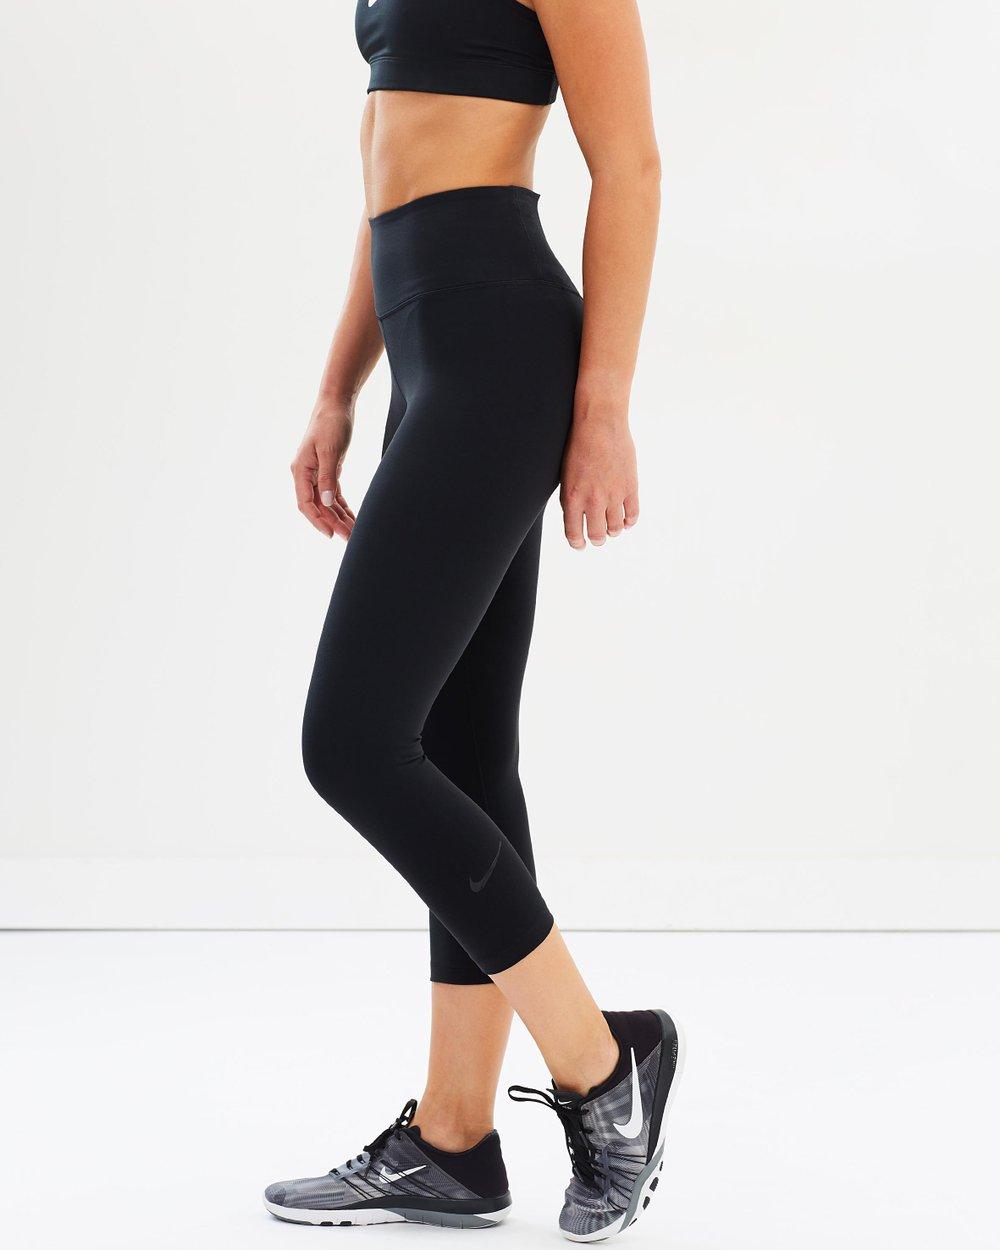 f7359884c2959 Women s Nike Sculpt Lux Crops Tights by Nike Online